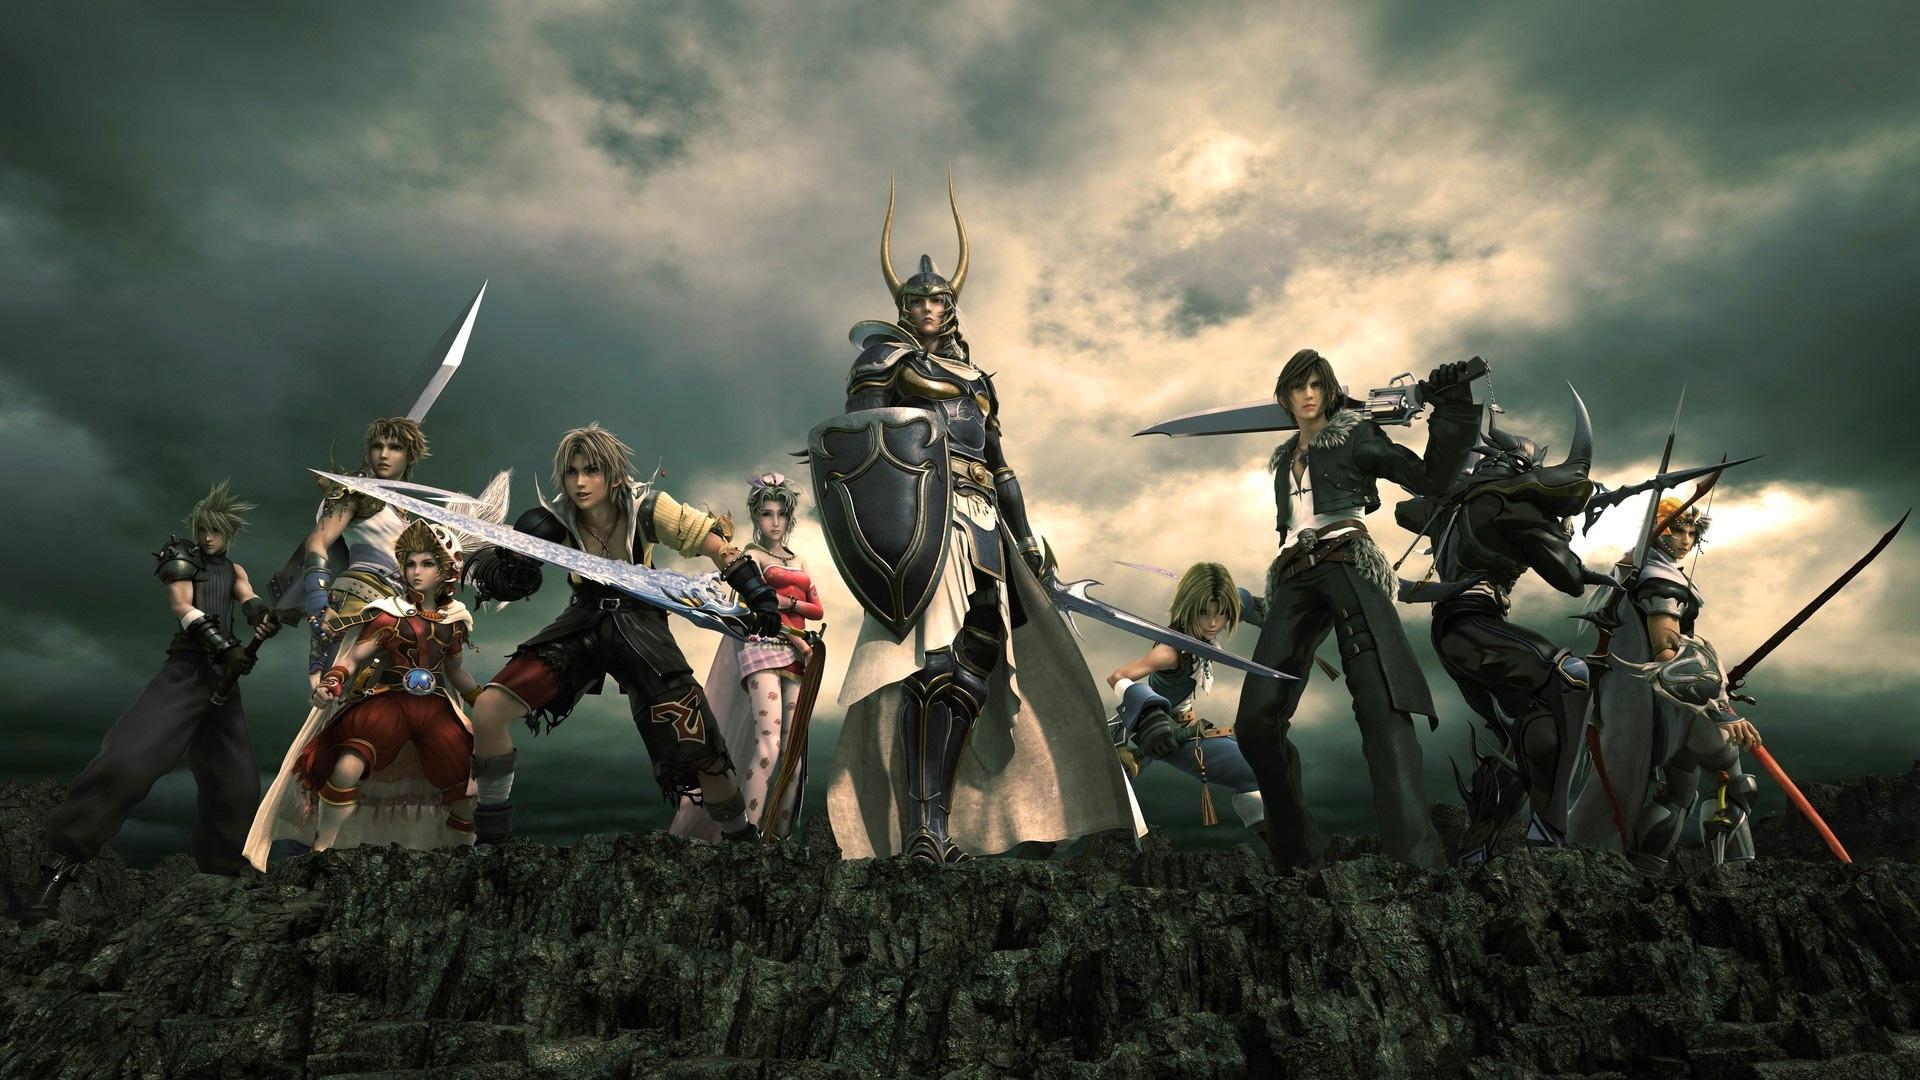 DISSIDIA Final Fantasy NT Wallpapers in Ultra HD 4K